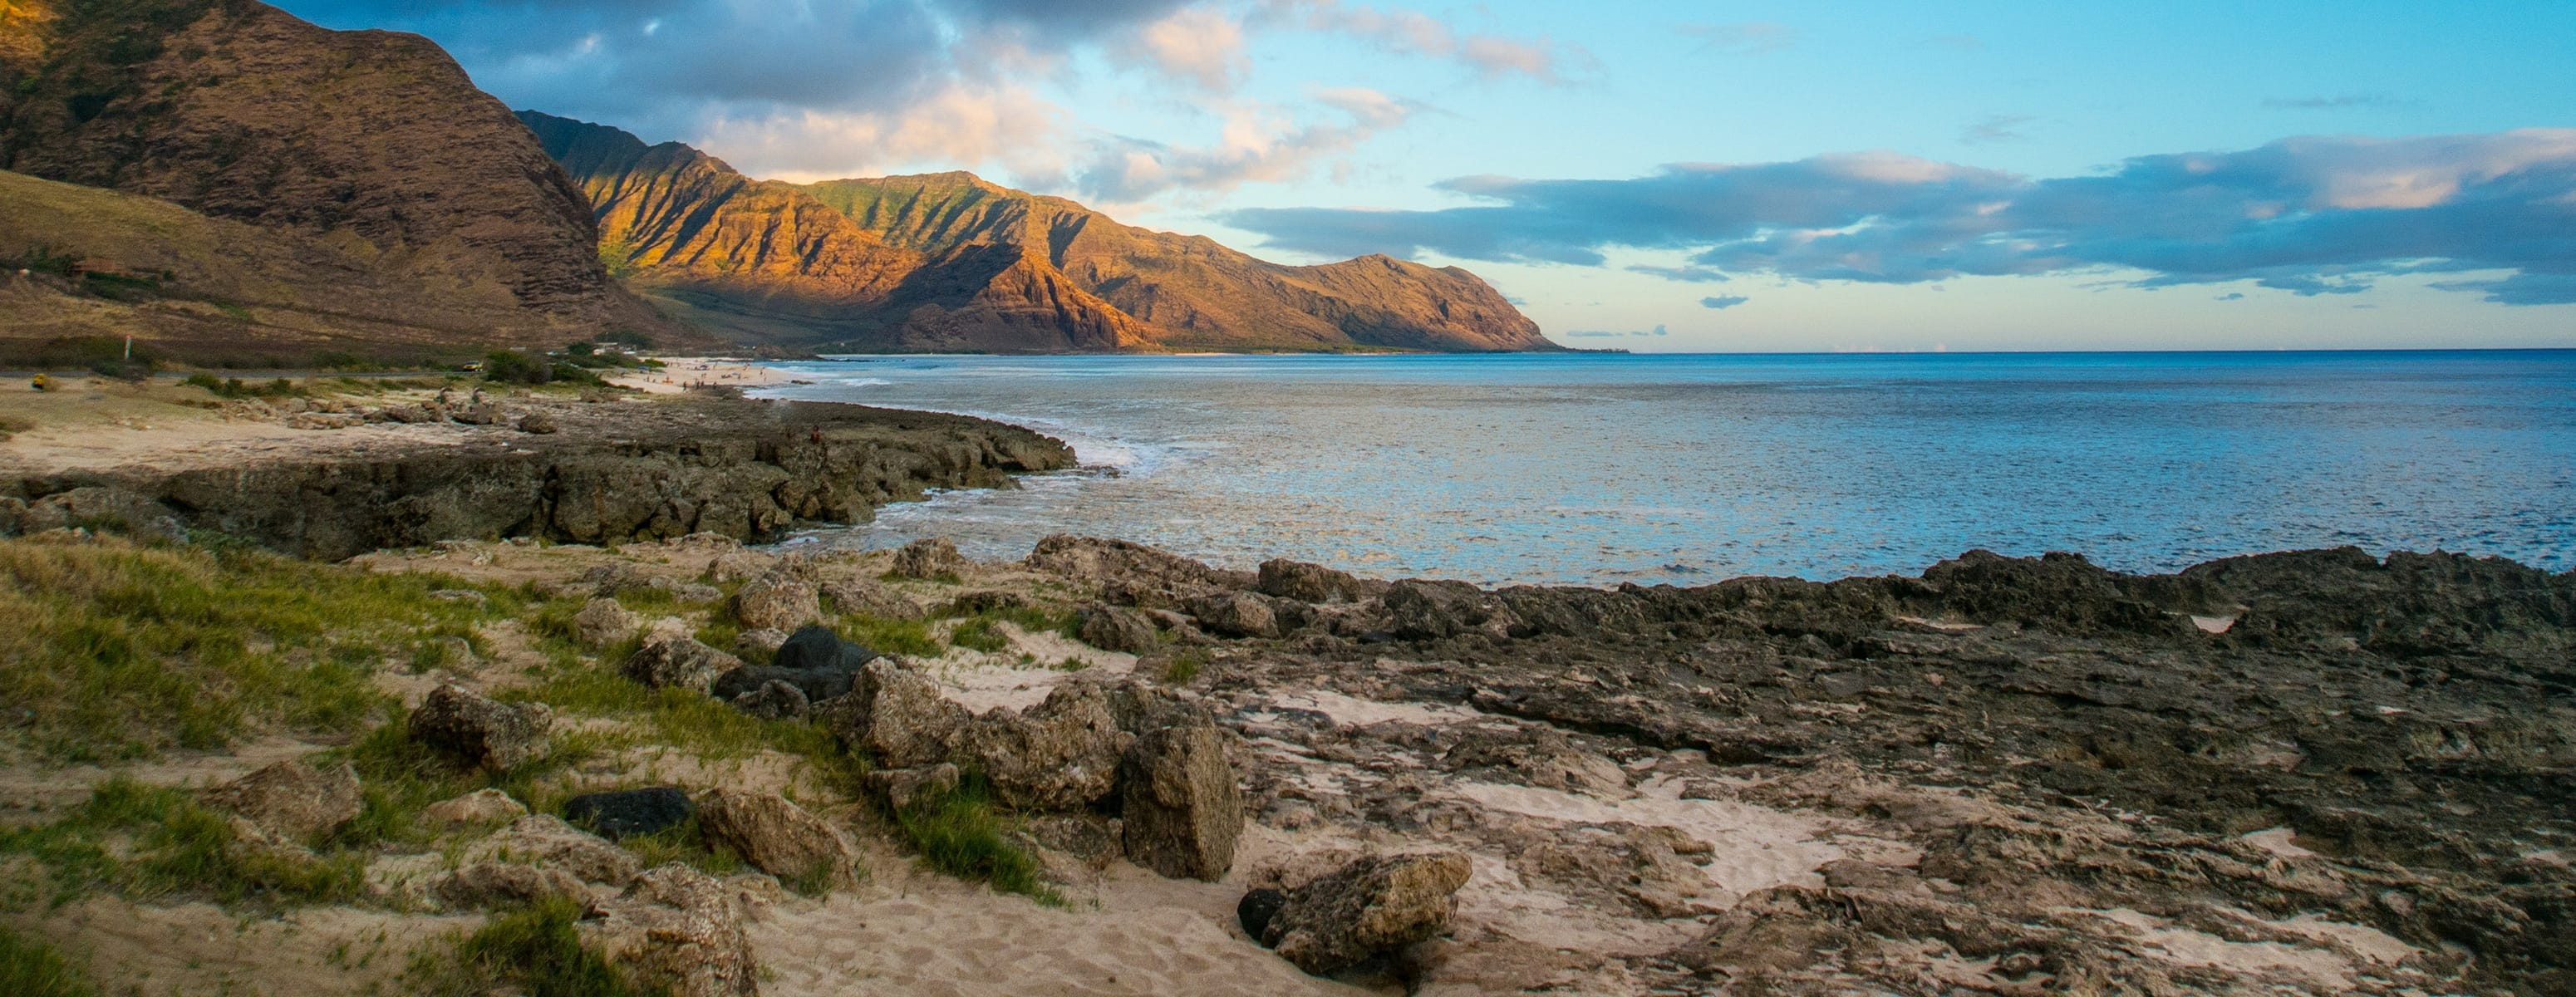 Hawaii 2017 Hawaii Vacation Rentals & Condo Rentals Airbnb